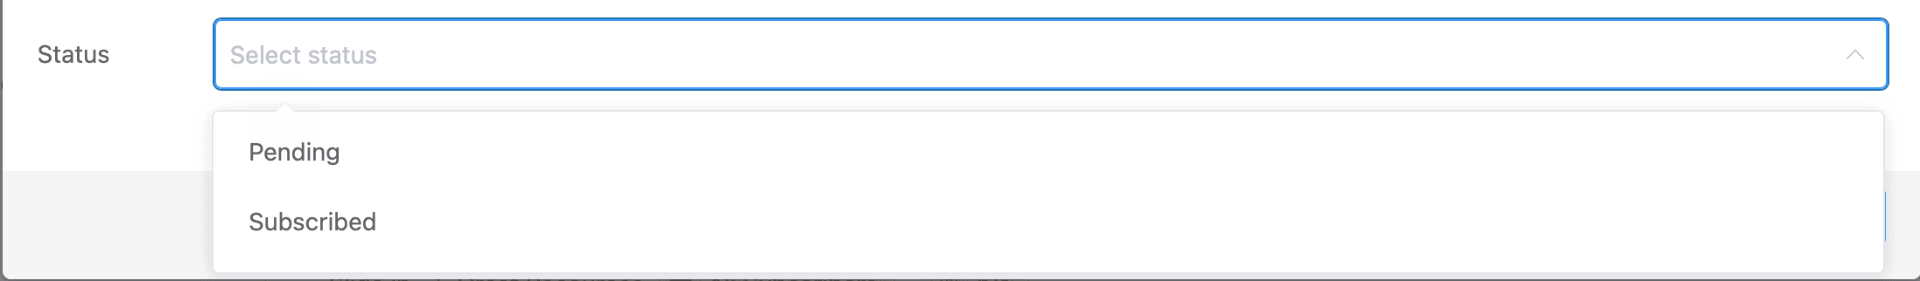 FluentCRM Web Hook Status